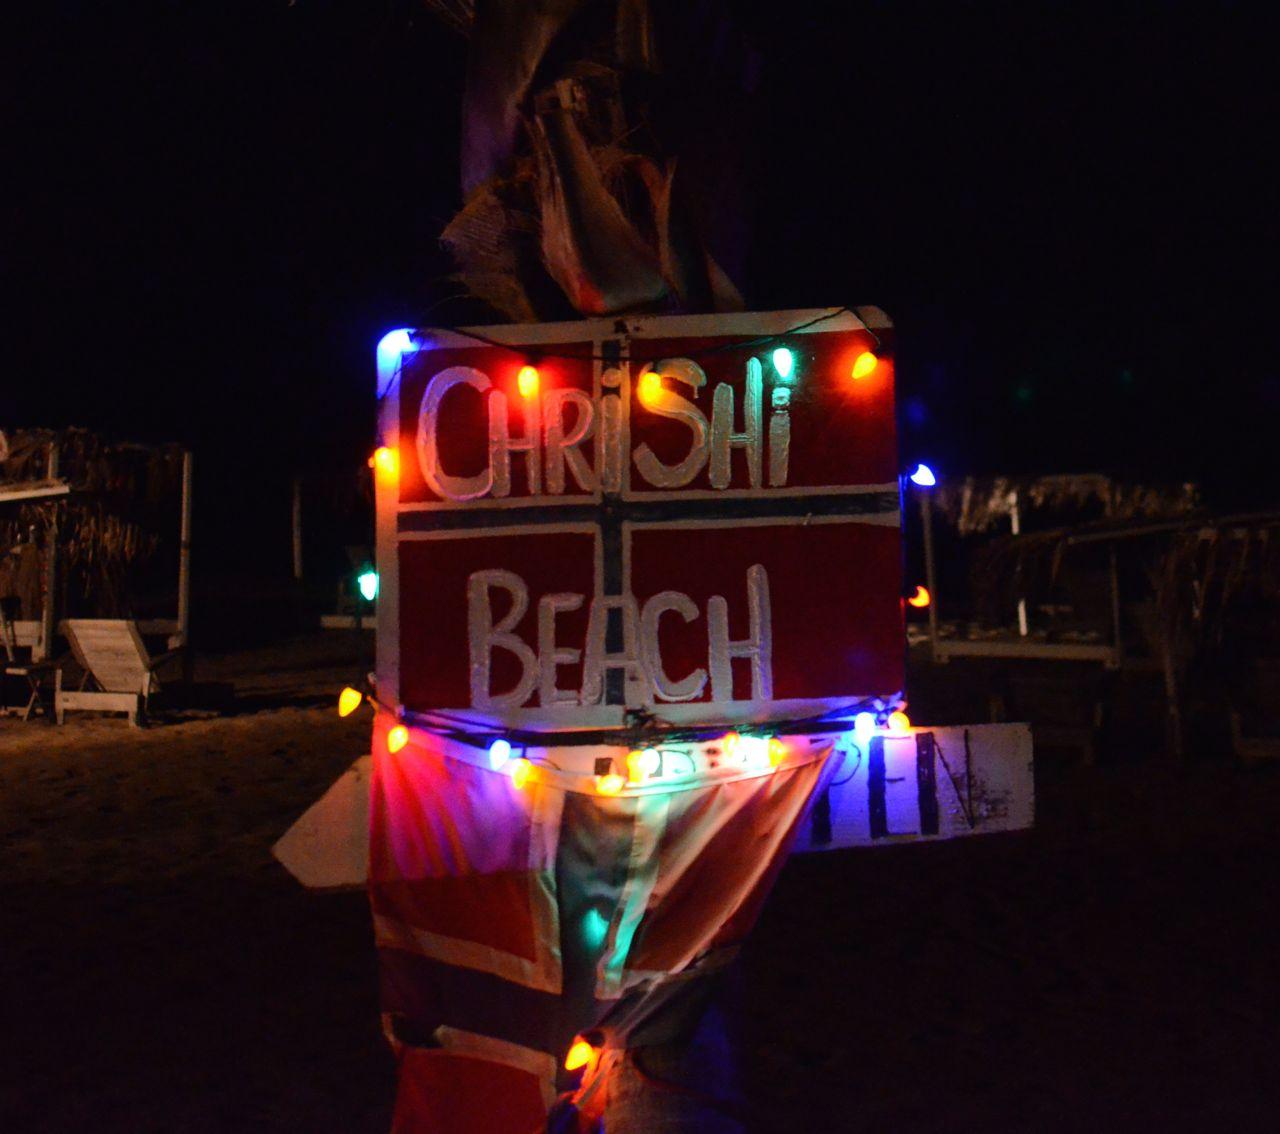 Chrishi Beach - Sign.jpg